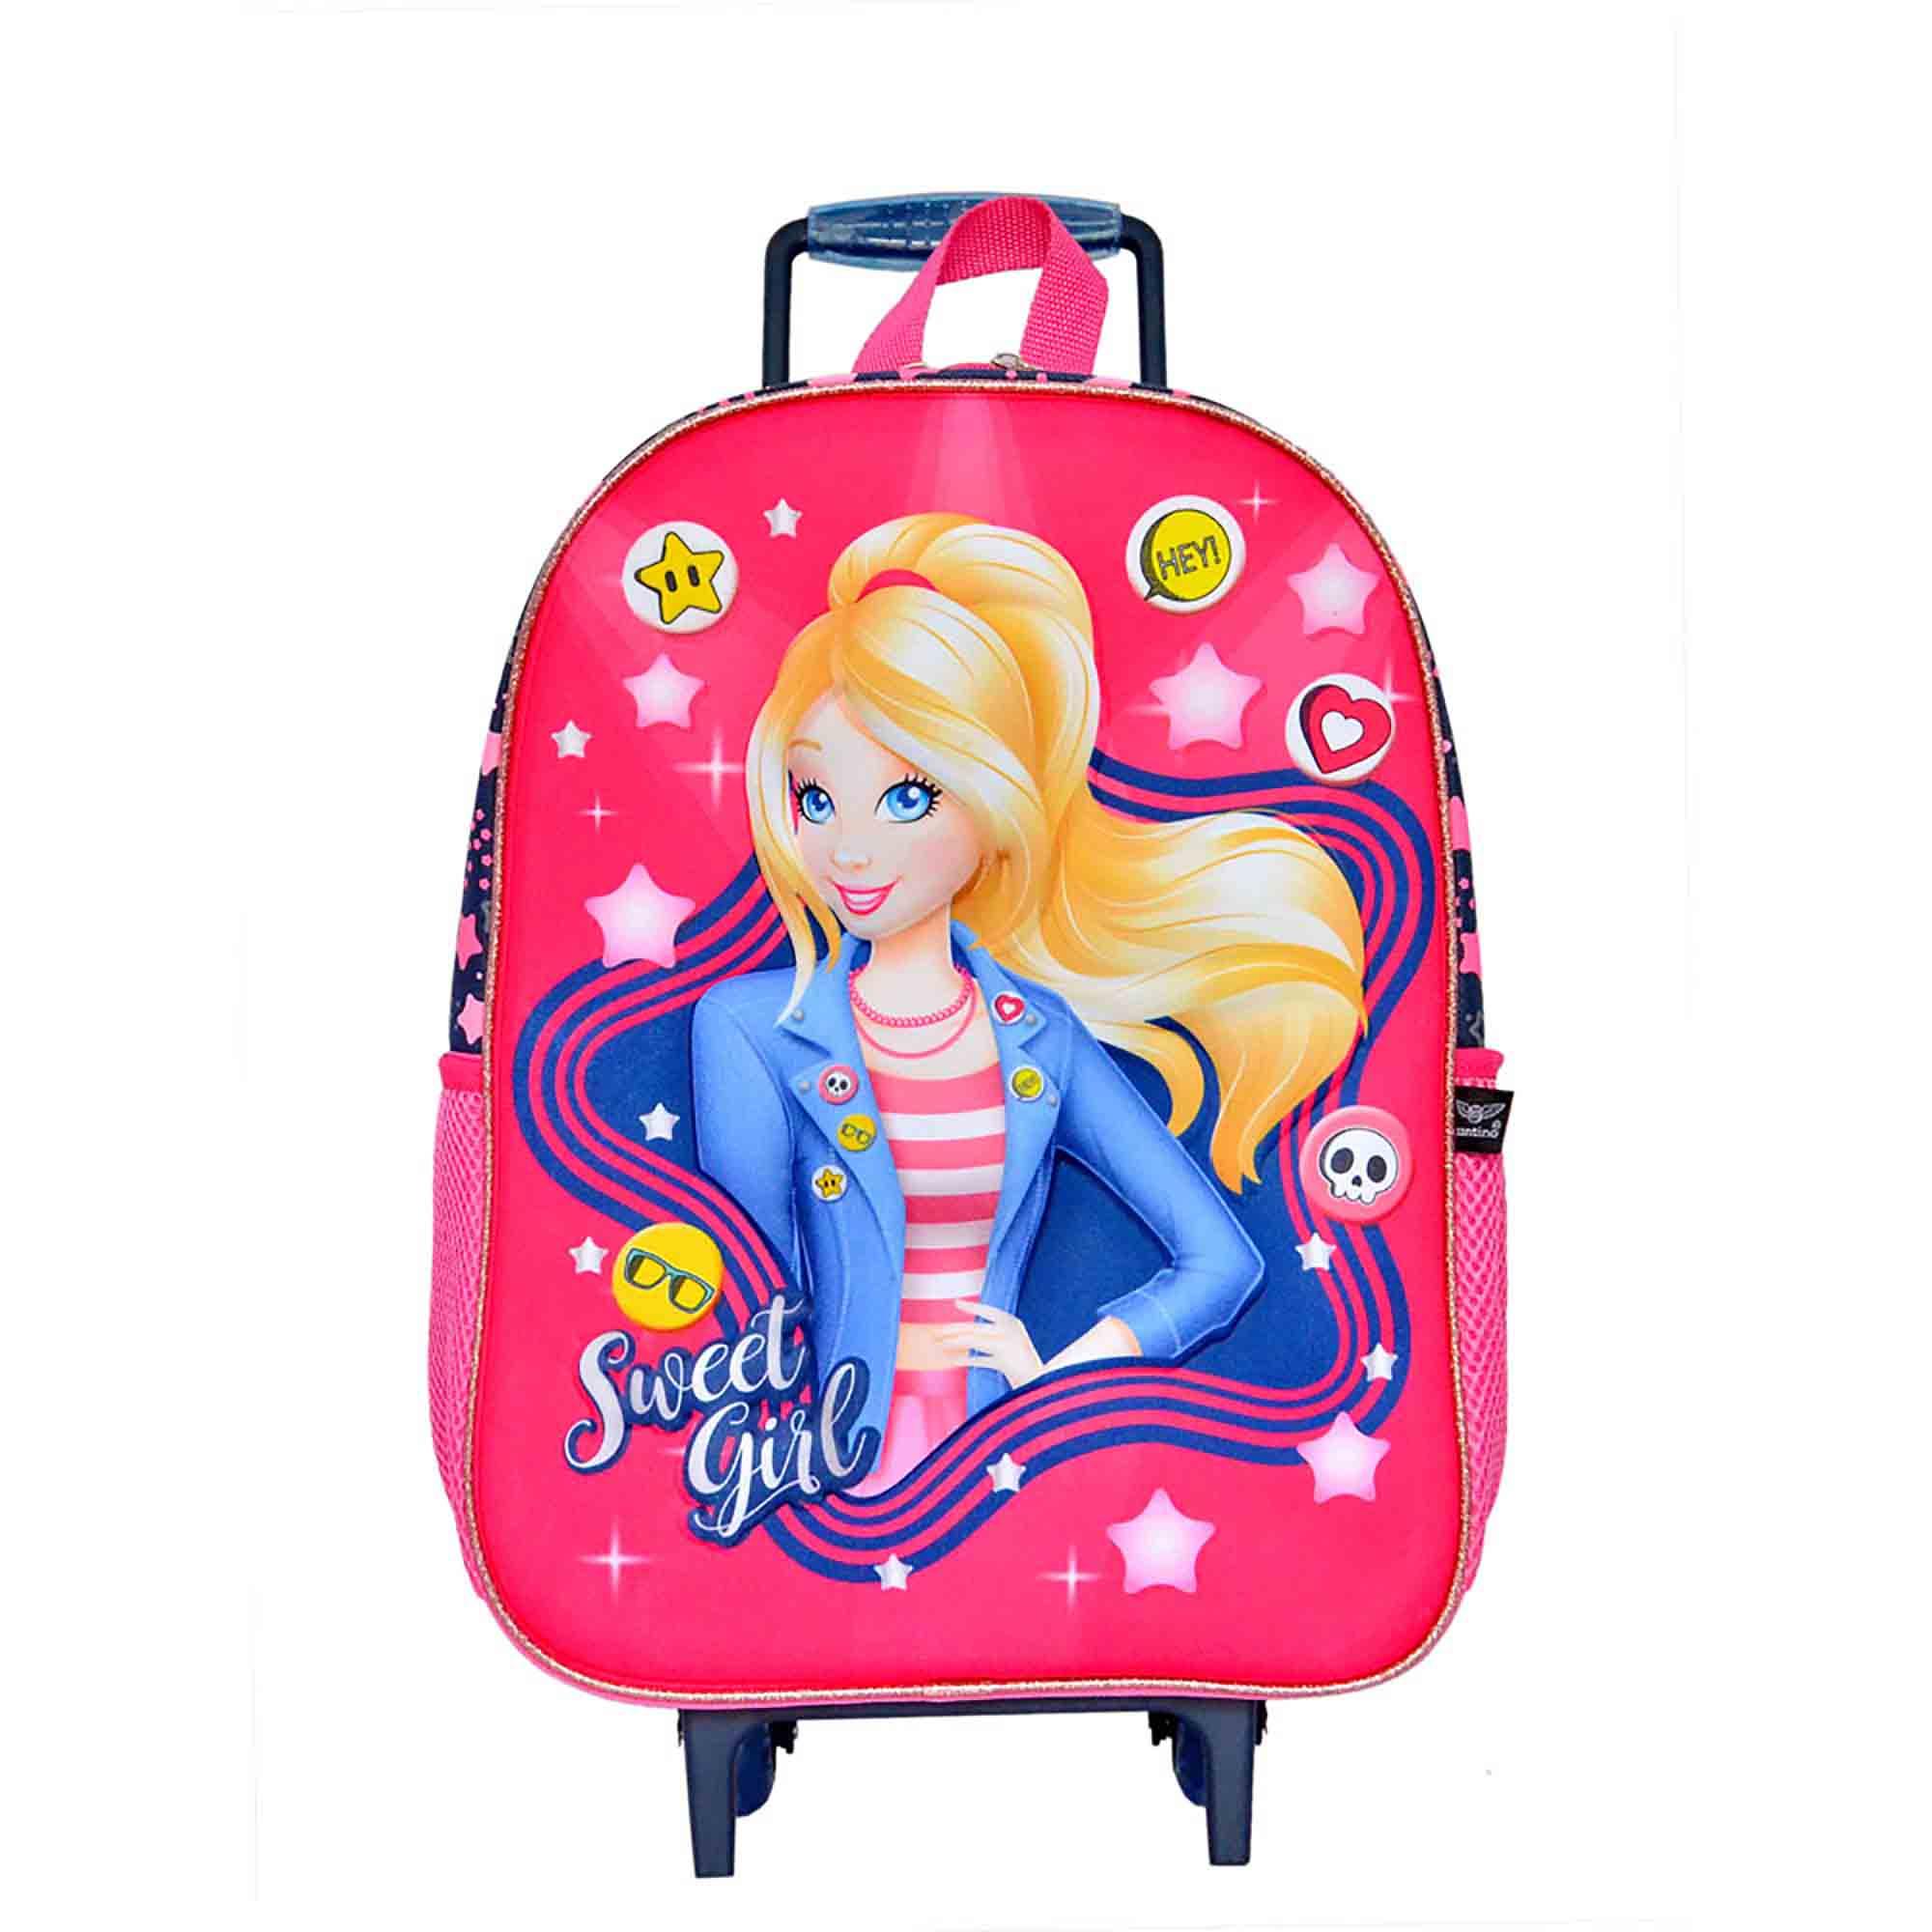 Mochila Infantil Princess Influence Poliéster Com Rodas Sweet Girl Pink